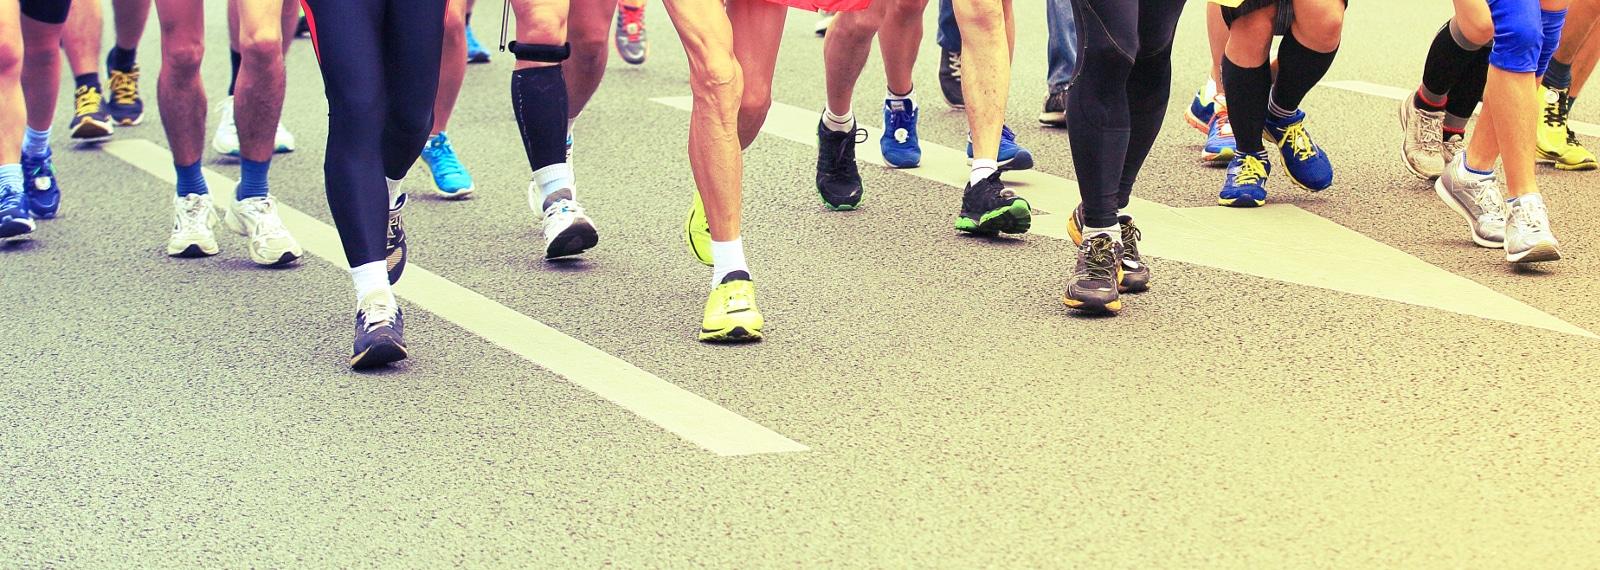 Marathon-in-Freibug